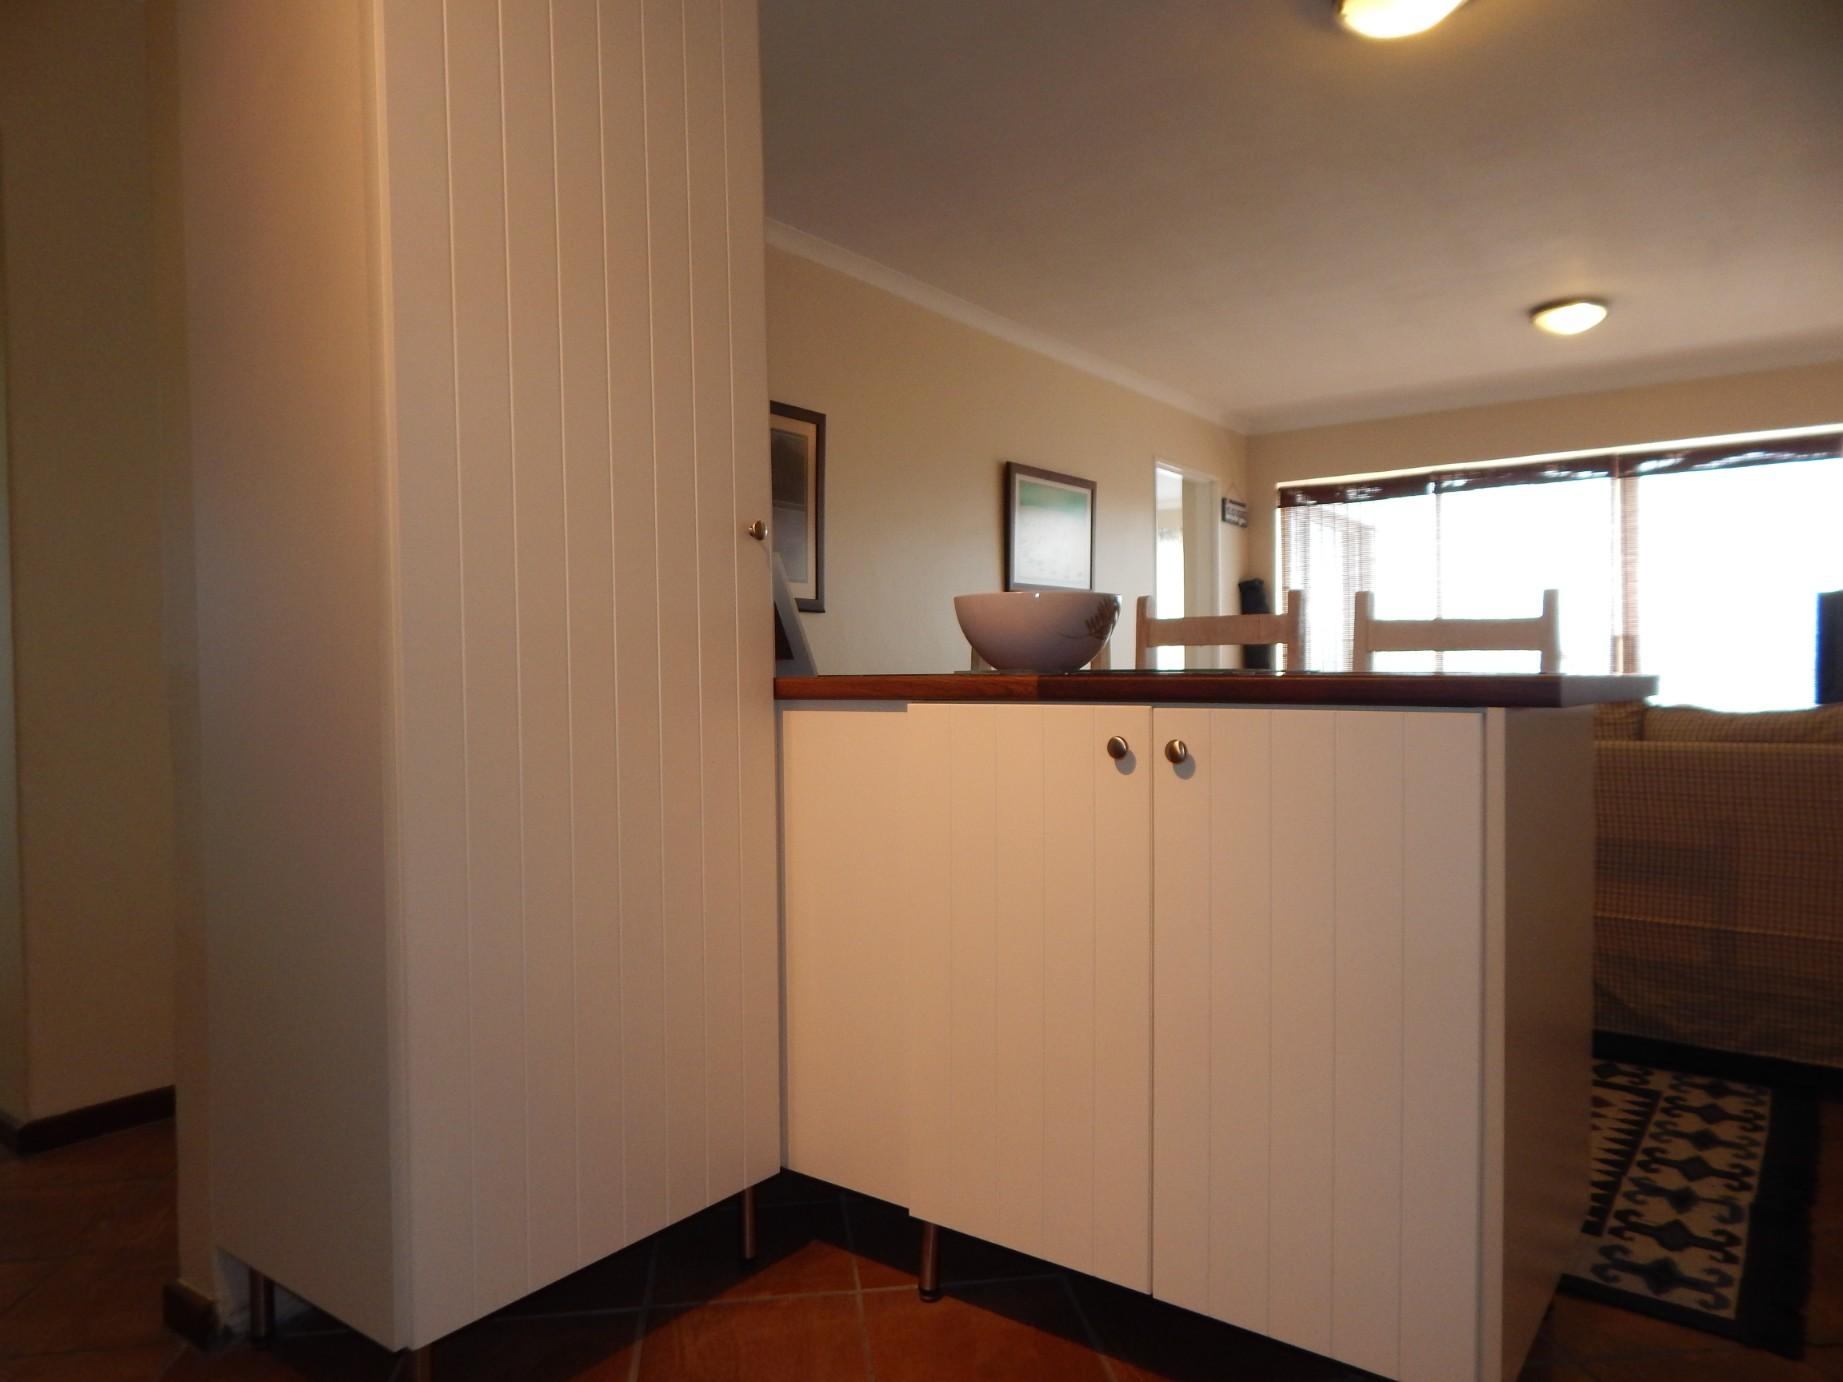 3 Bedroom Apartment for sale in De Bakke ENT0066483 : photo#6